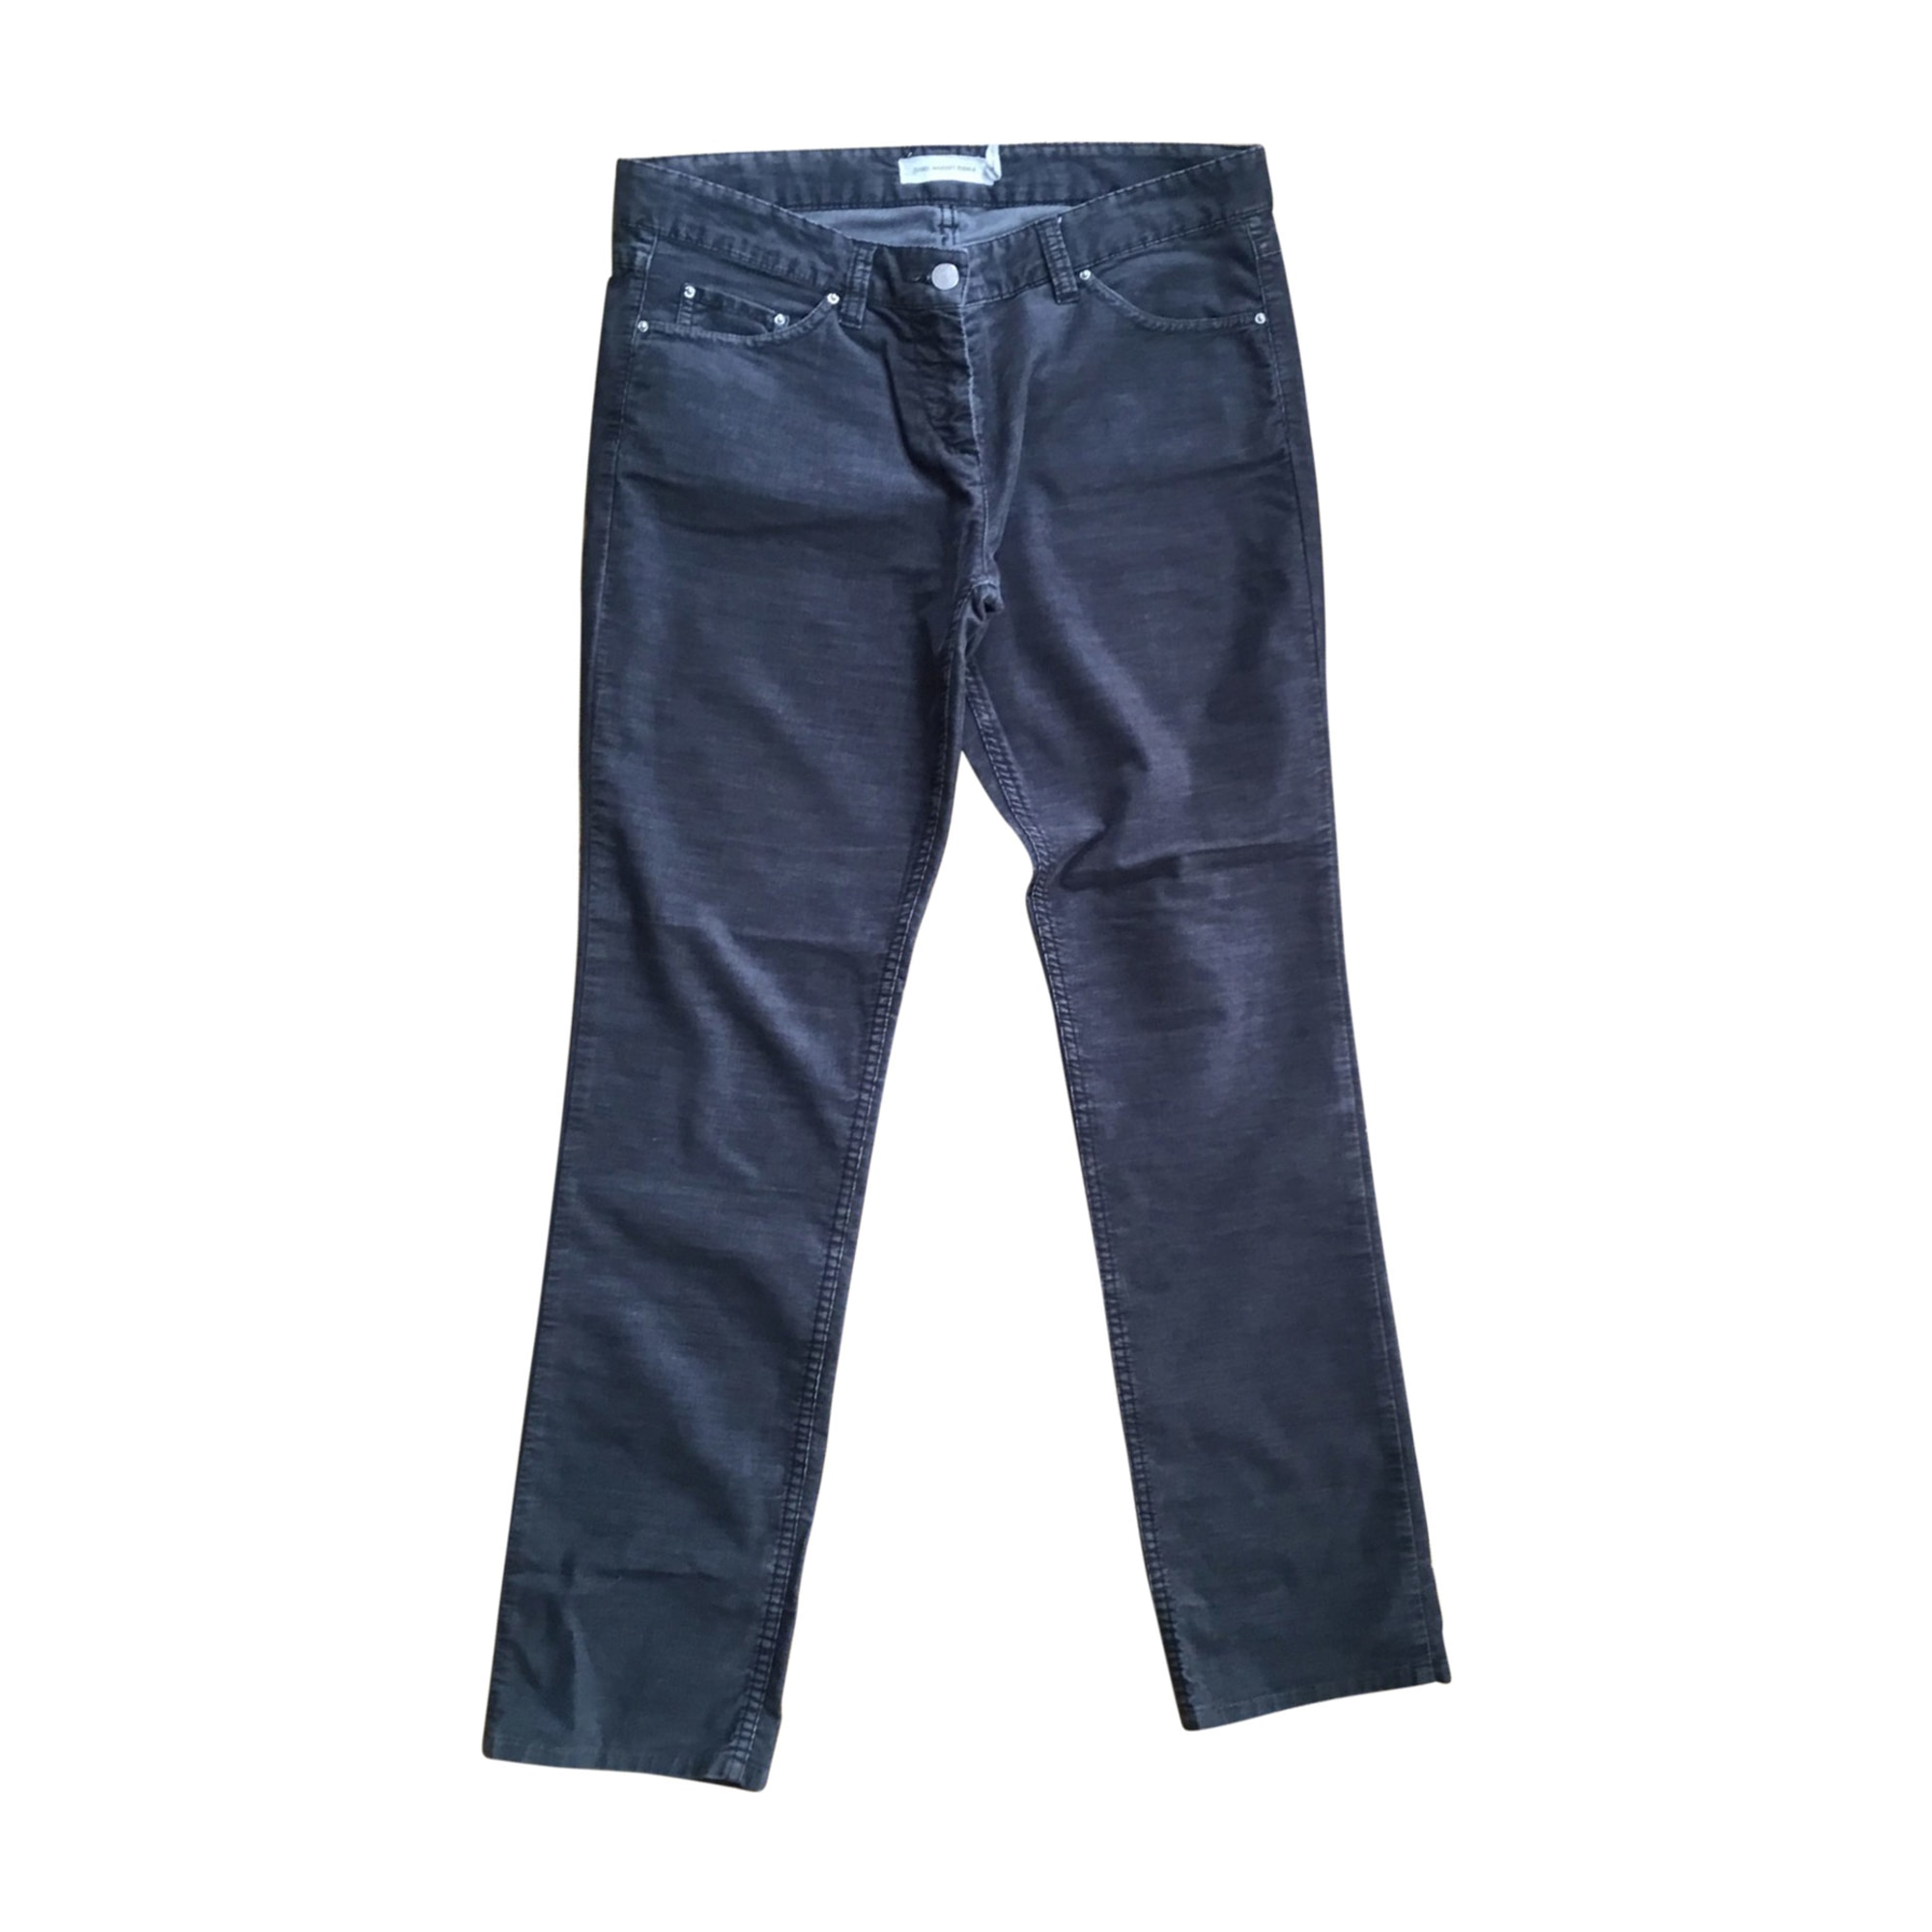 Straight Leg Jeans ISABEL MARANT Gray, charcoal